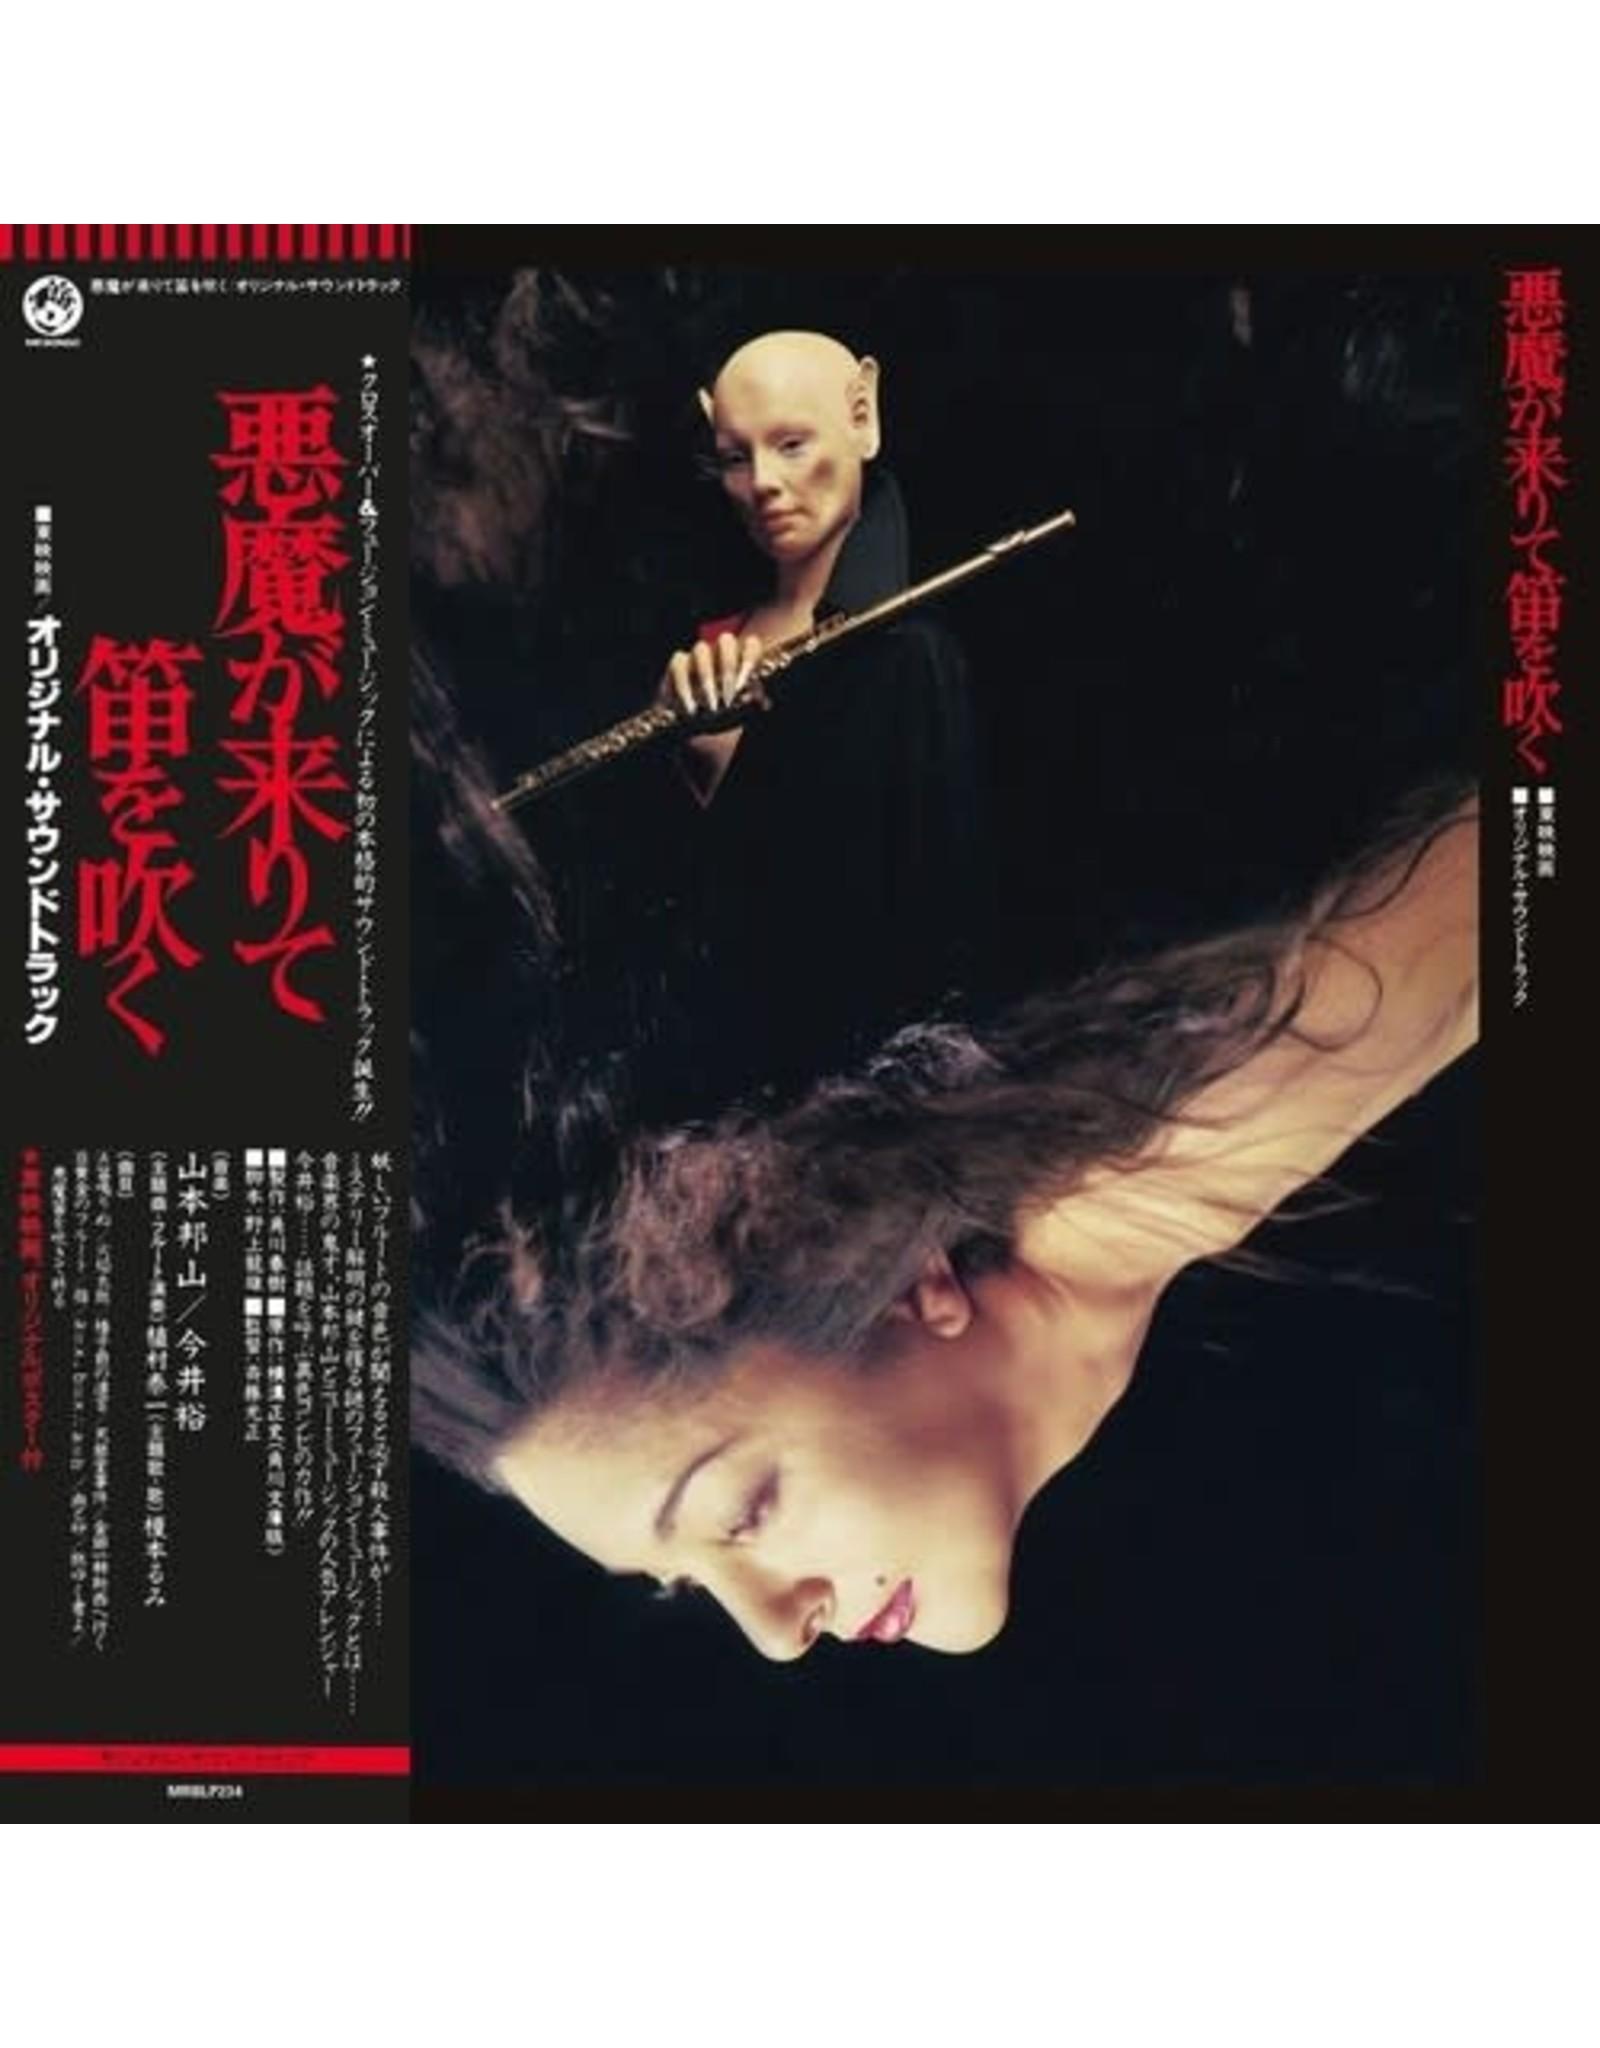 New Vinyl Hozan Yamamoto - Akuma Ga Kitarite Fue Wo Fuku OST